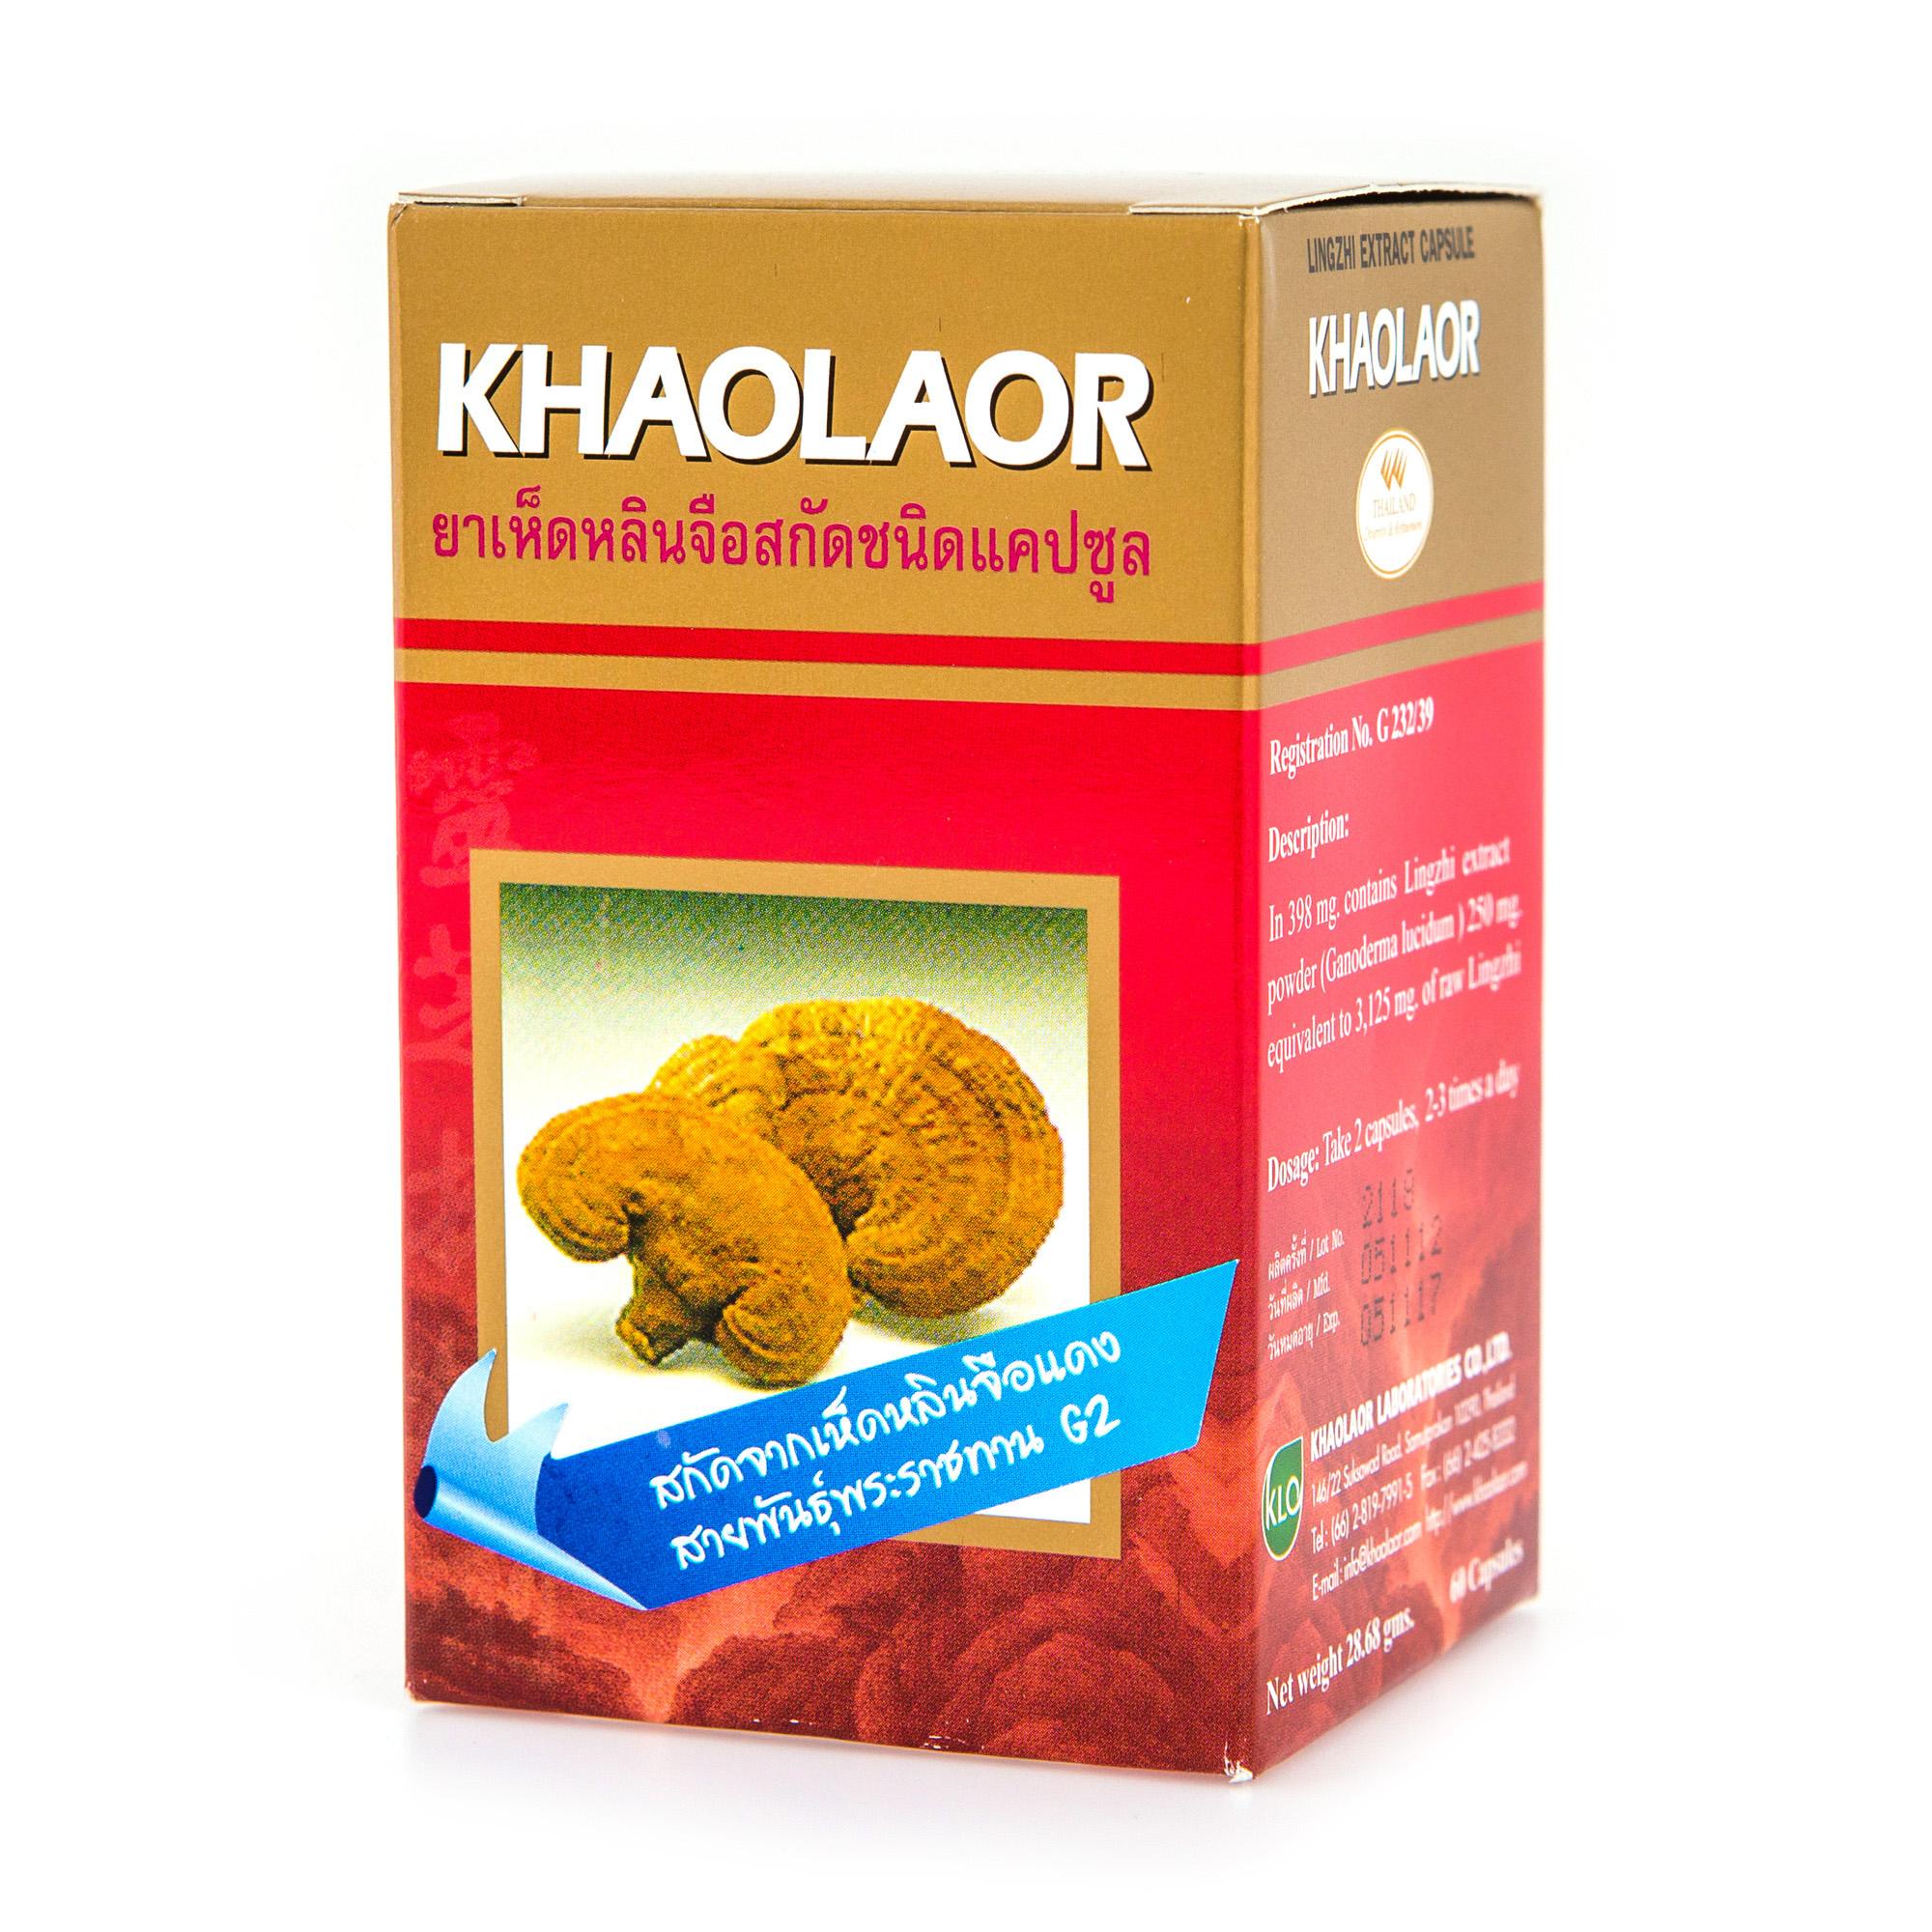 Khaolaor ยาเห็ดหลินจือสกัด สายพันธุ์พระราชทาน G2